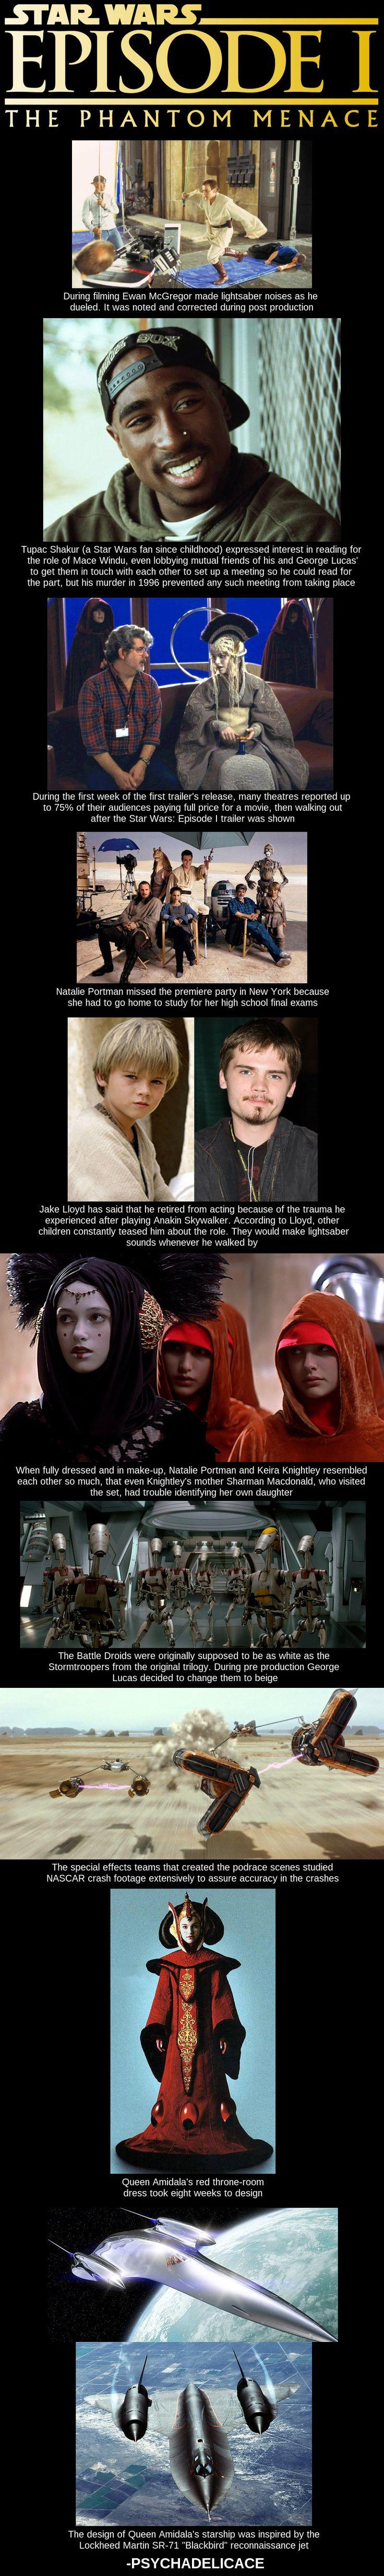 Phantom Menace Factoids #StarWars